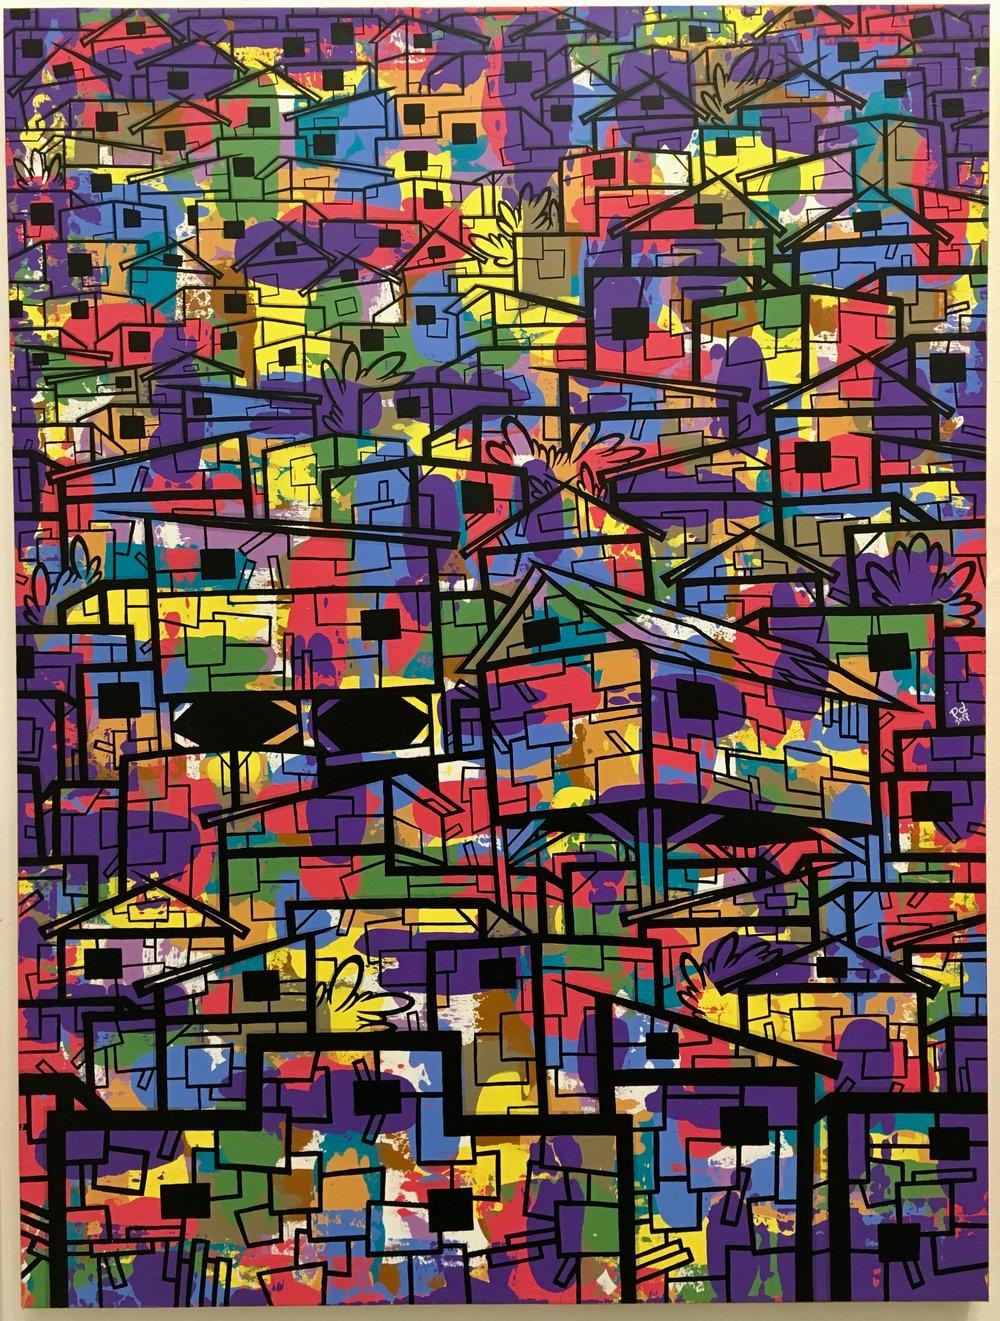 sLum 6#Acrylic & ink on canvas#48 x 36 inches#$3900